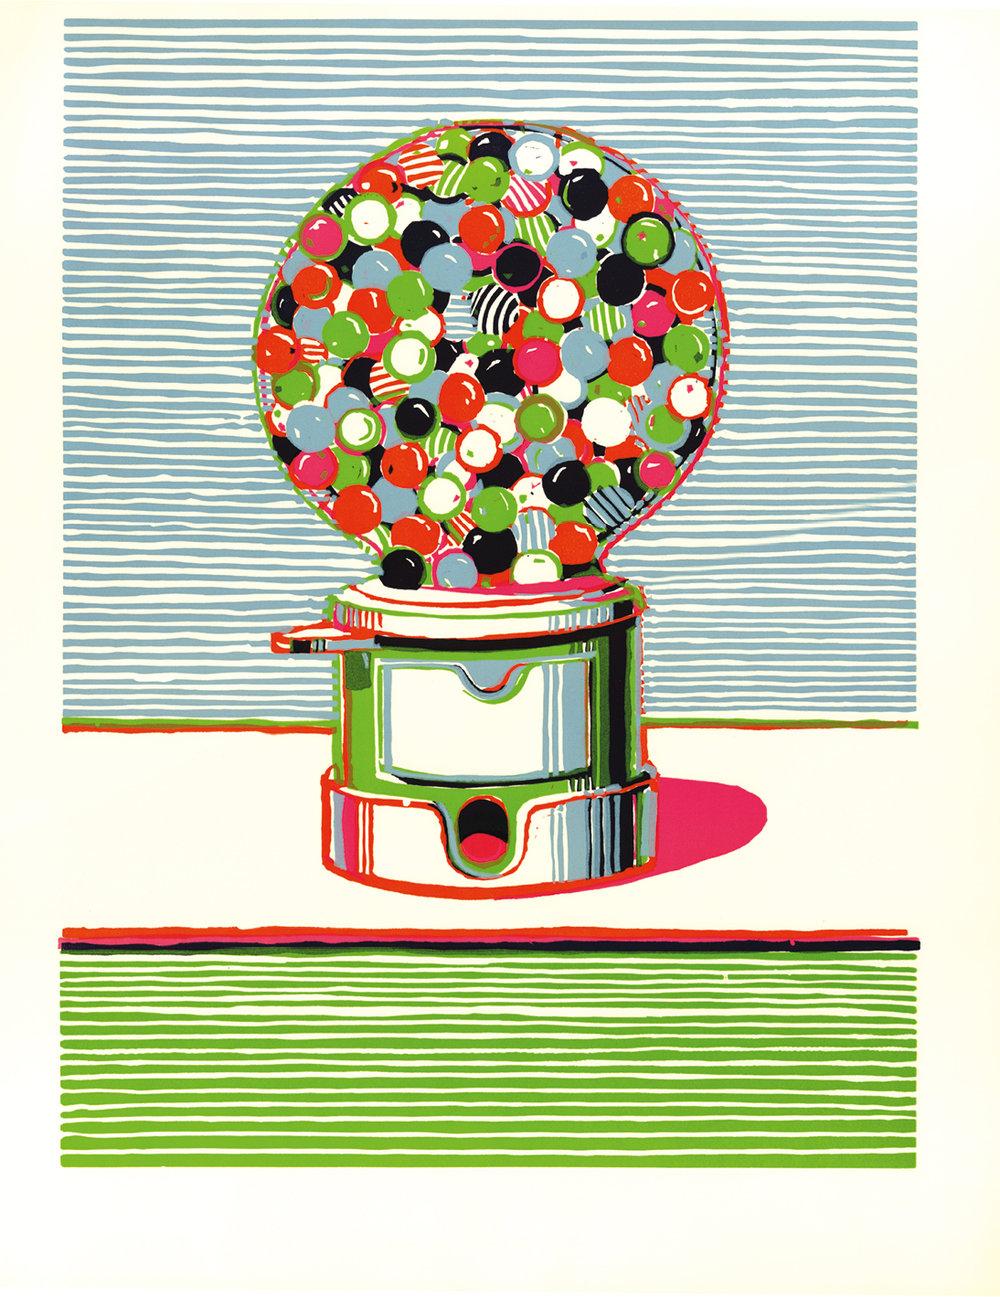 Wayne Thiebaud (b.1920), Gumball Machine. Colour linocut, 1970. © Wayne Thiebaud/DACS, London/VAGA, New York 2016.